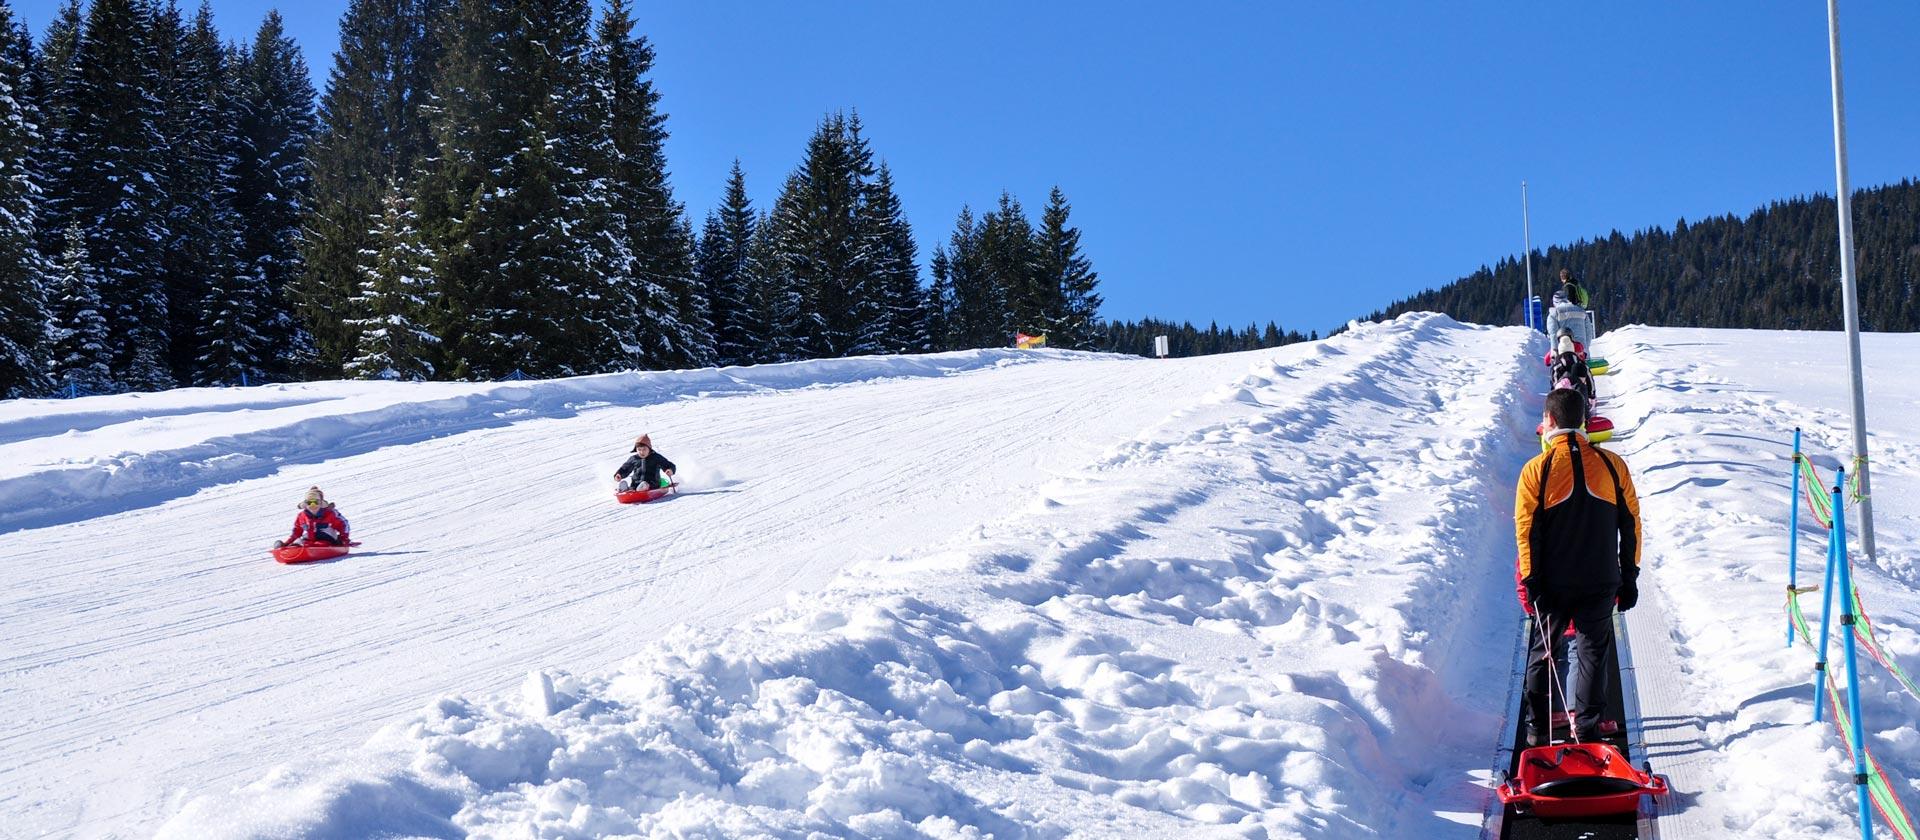 snow fun park piste